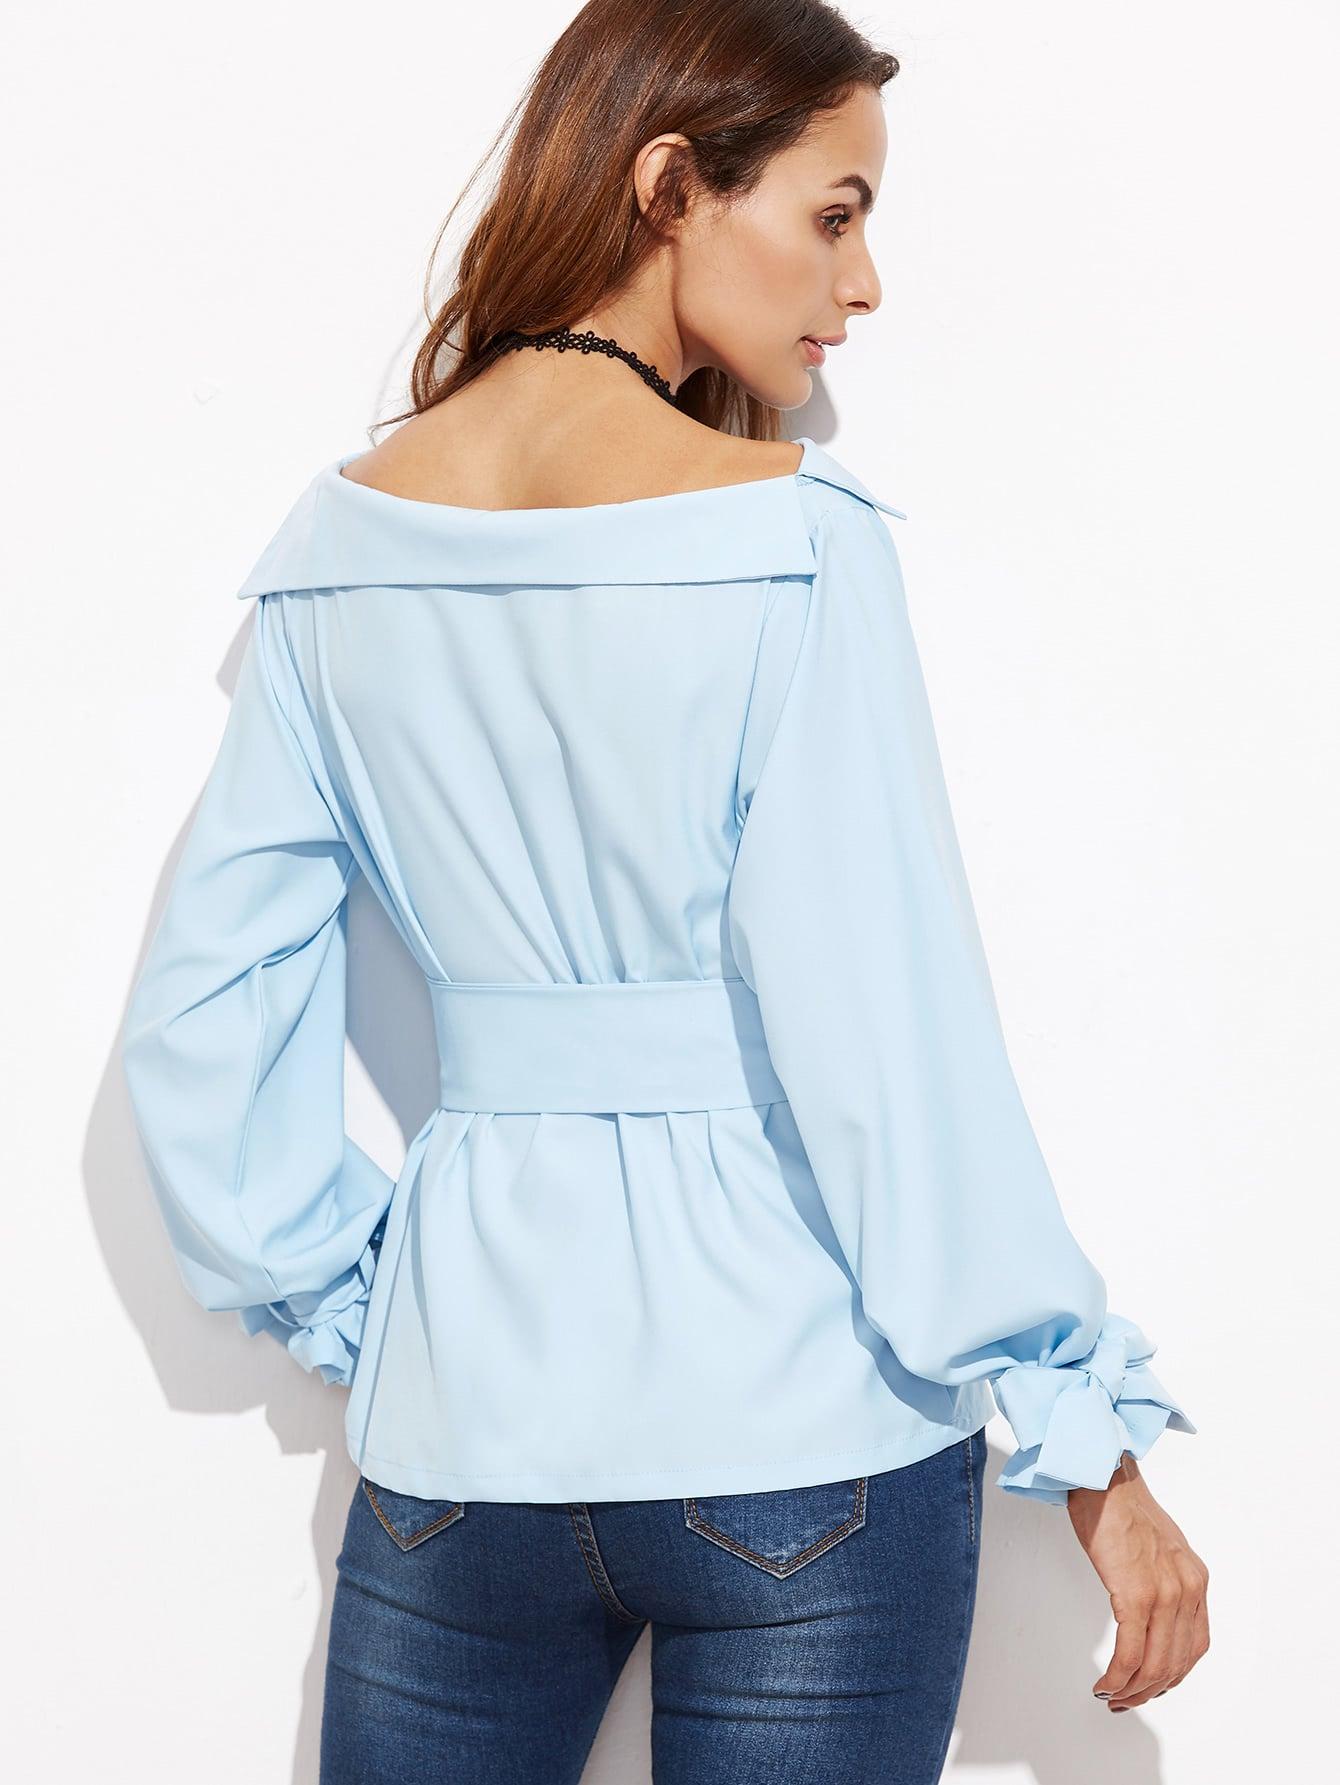 blouse161011451_2